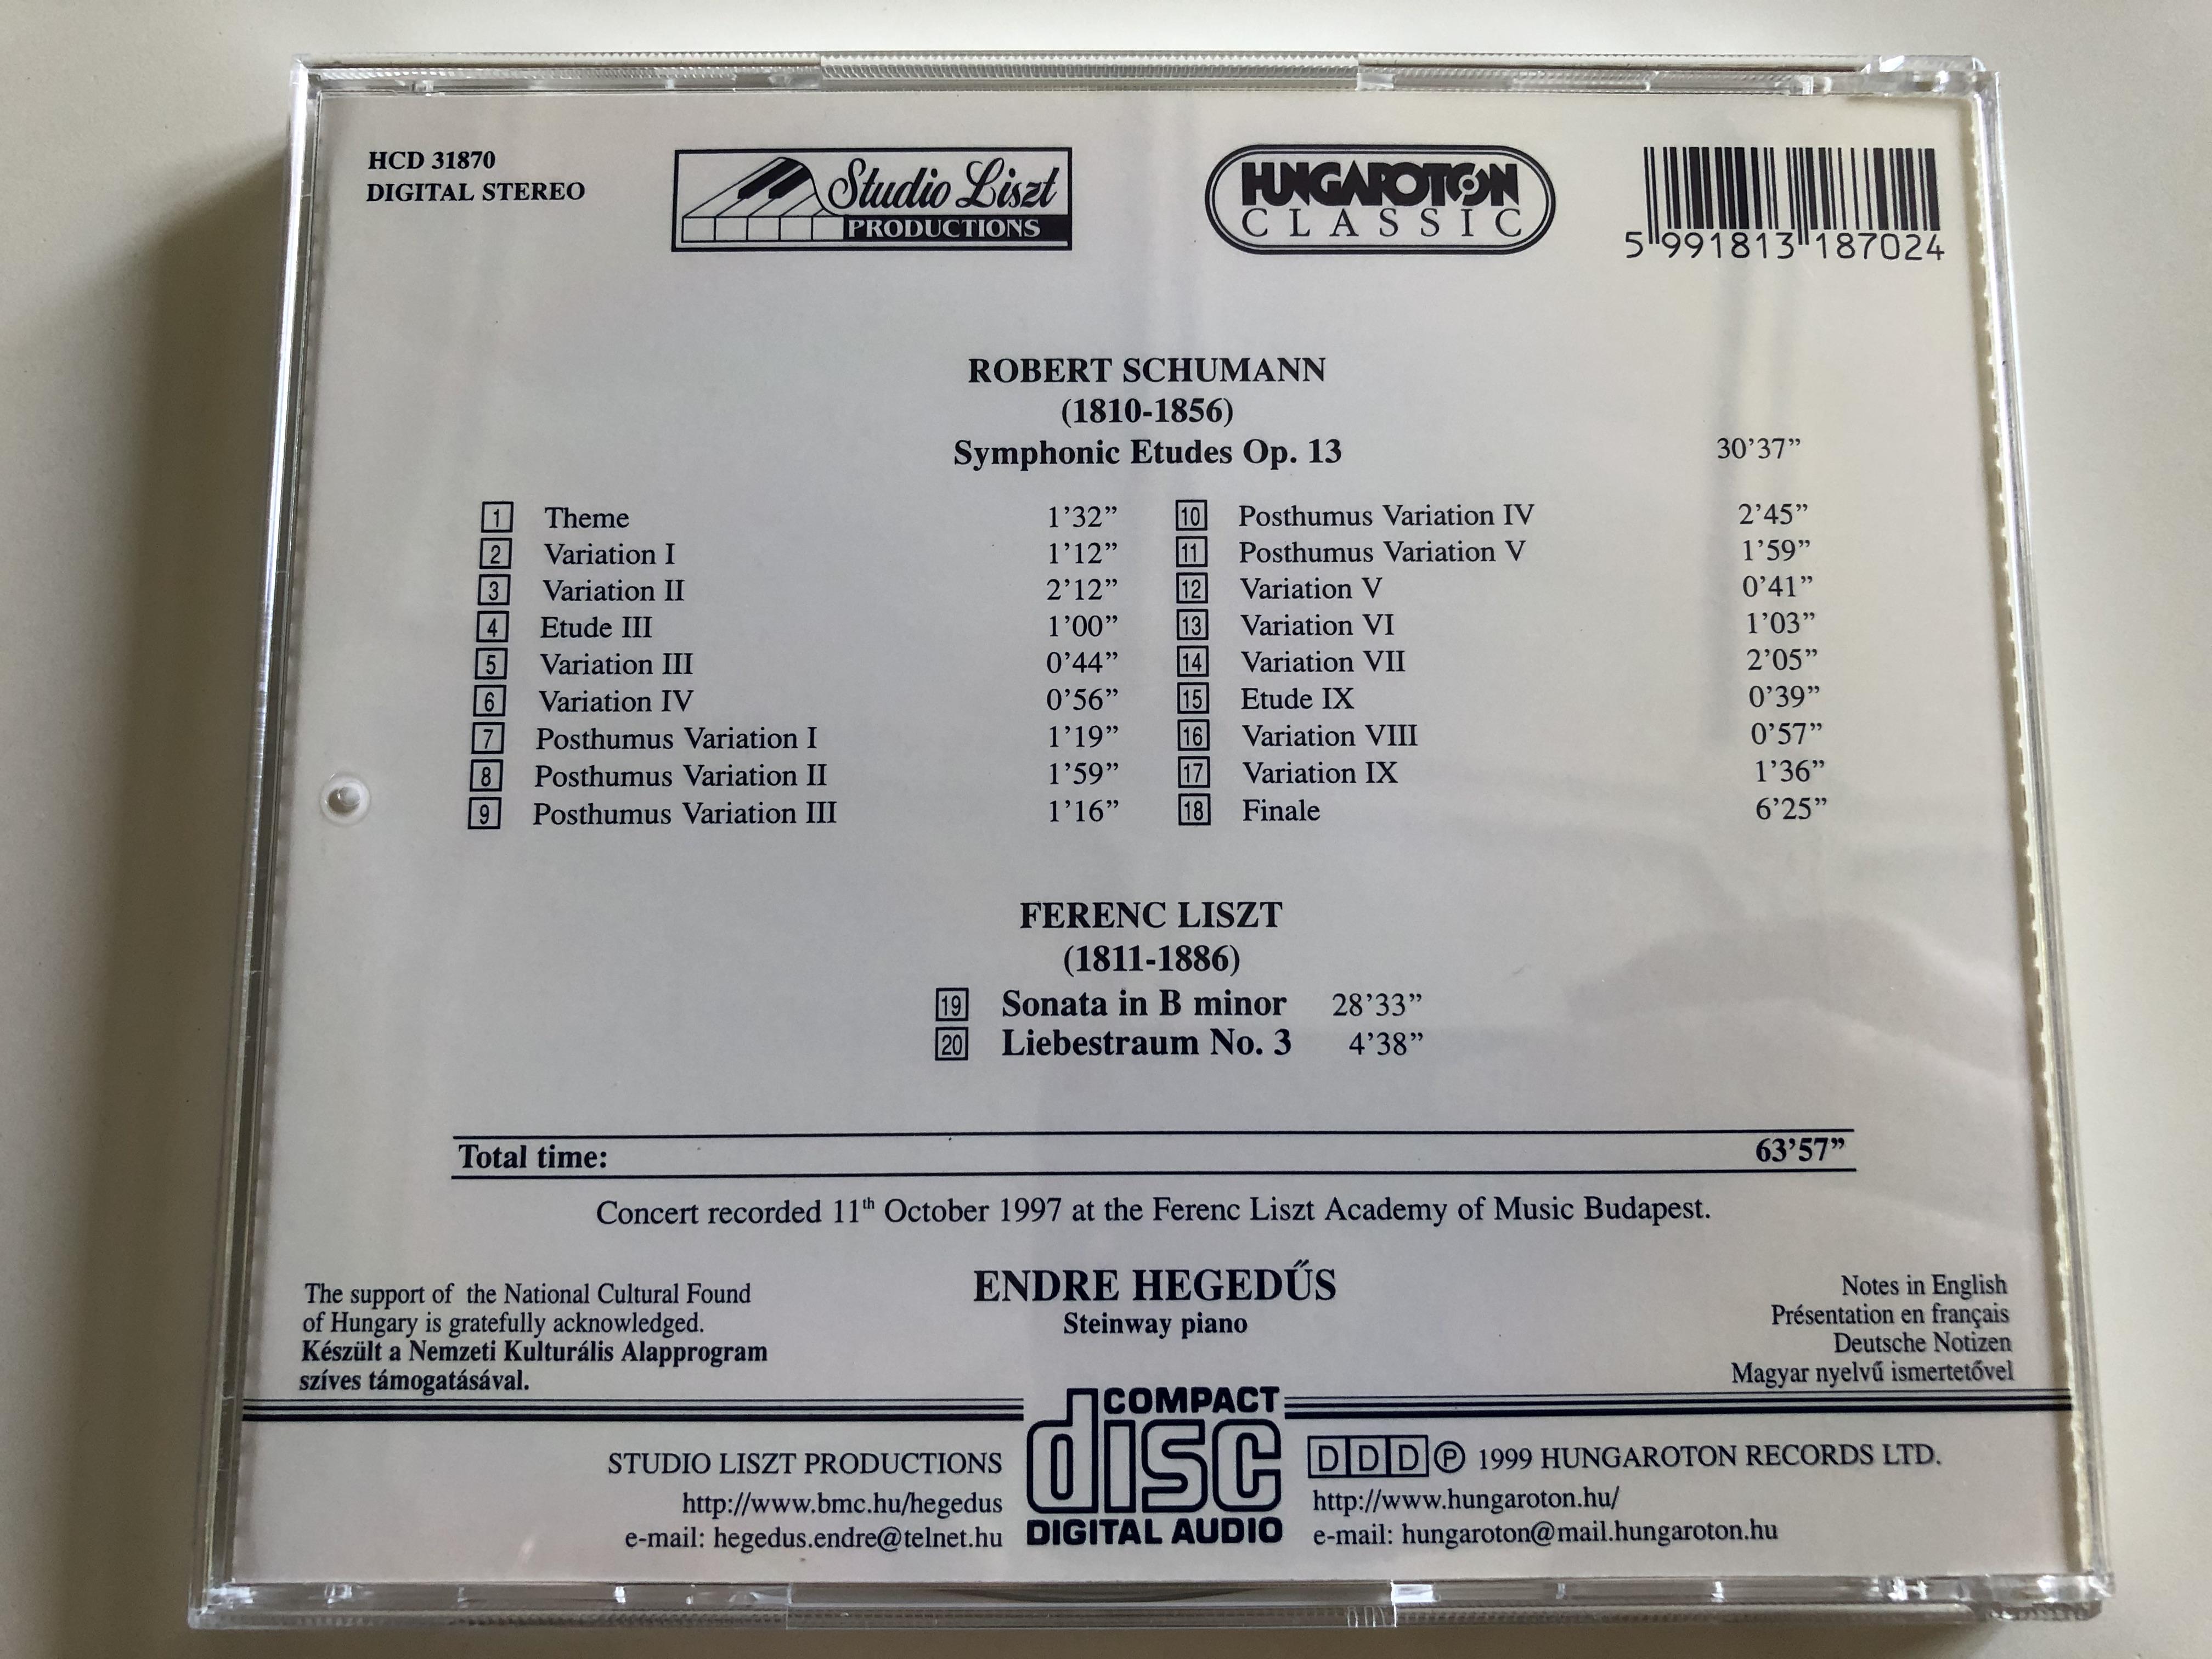 schumann-symphonic-etudes-liszt-sonata-in-b-minor-endre-heged-s-piano-live-recording-hungaroton-classic-audio-cd-1999-hcd-31870-8-.jpg